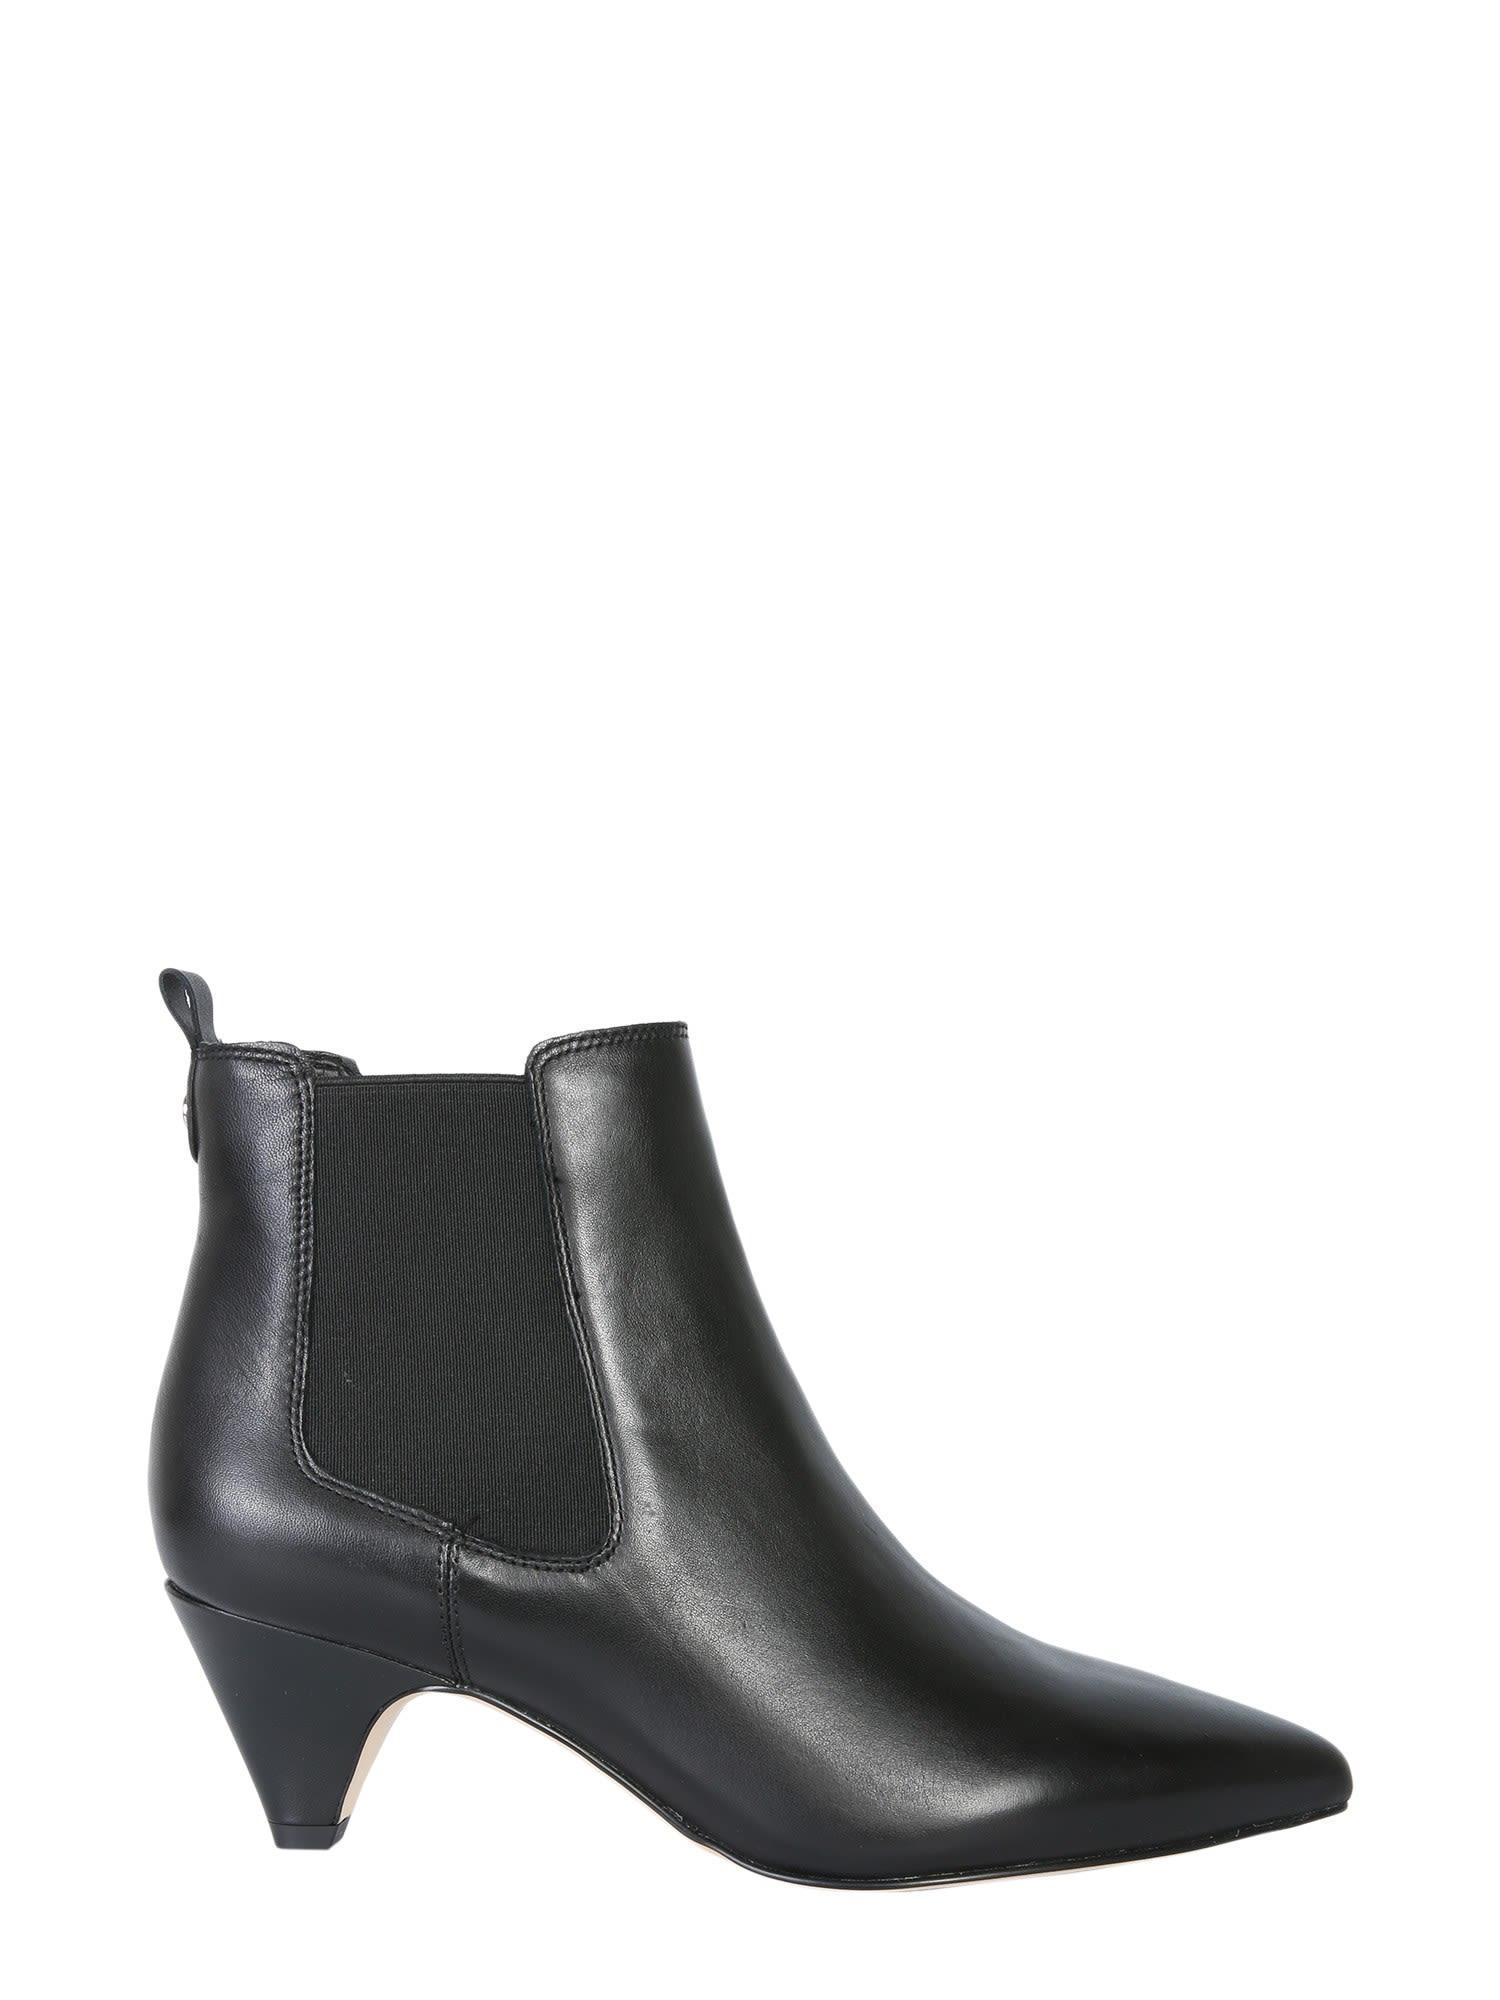 1ba965693db7 Sam Edelman Katt Ankle Boots In Nero